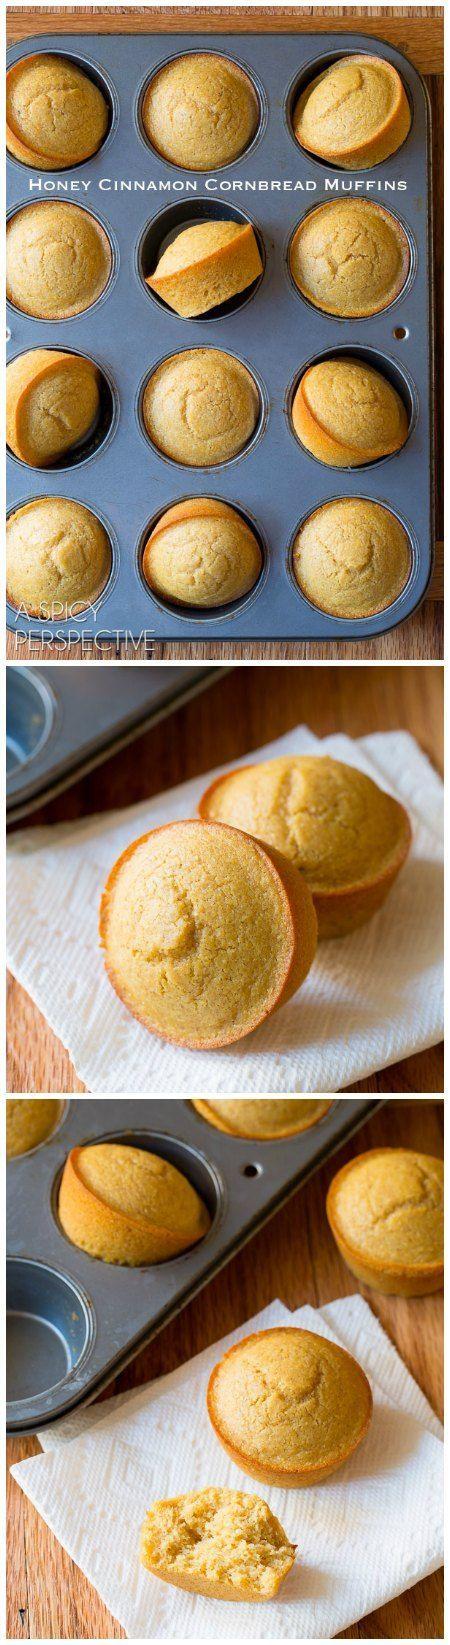 THE BEST Honey Cinnamon Cornbread Muffins on http://ASpicyPerspective.com #cornbread #bread